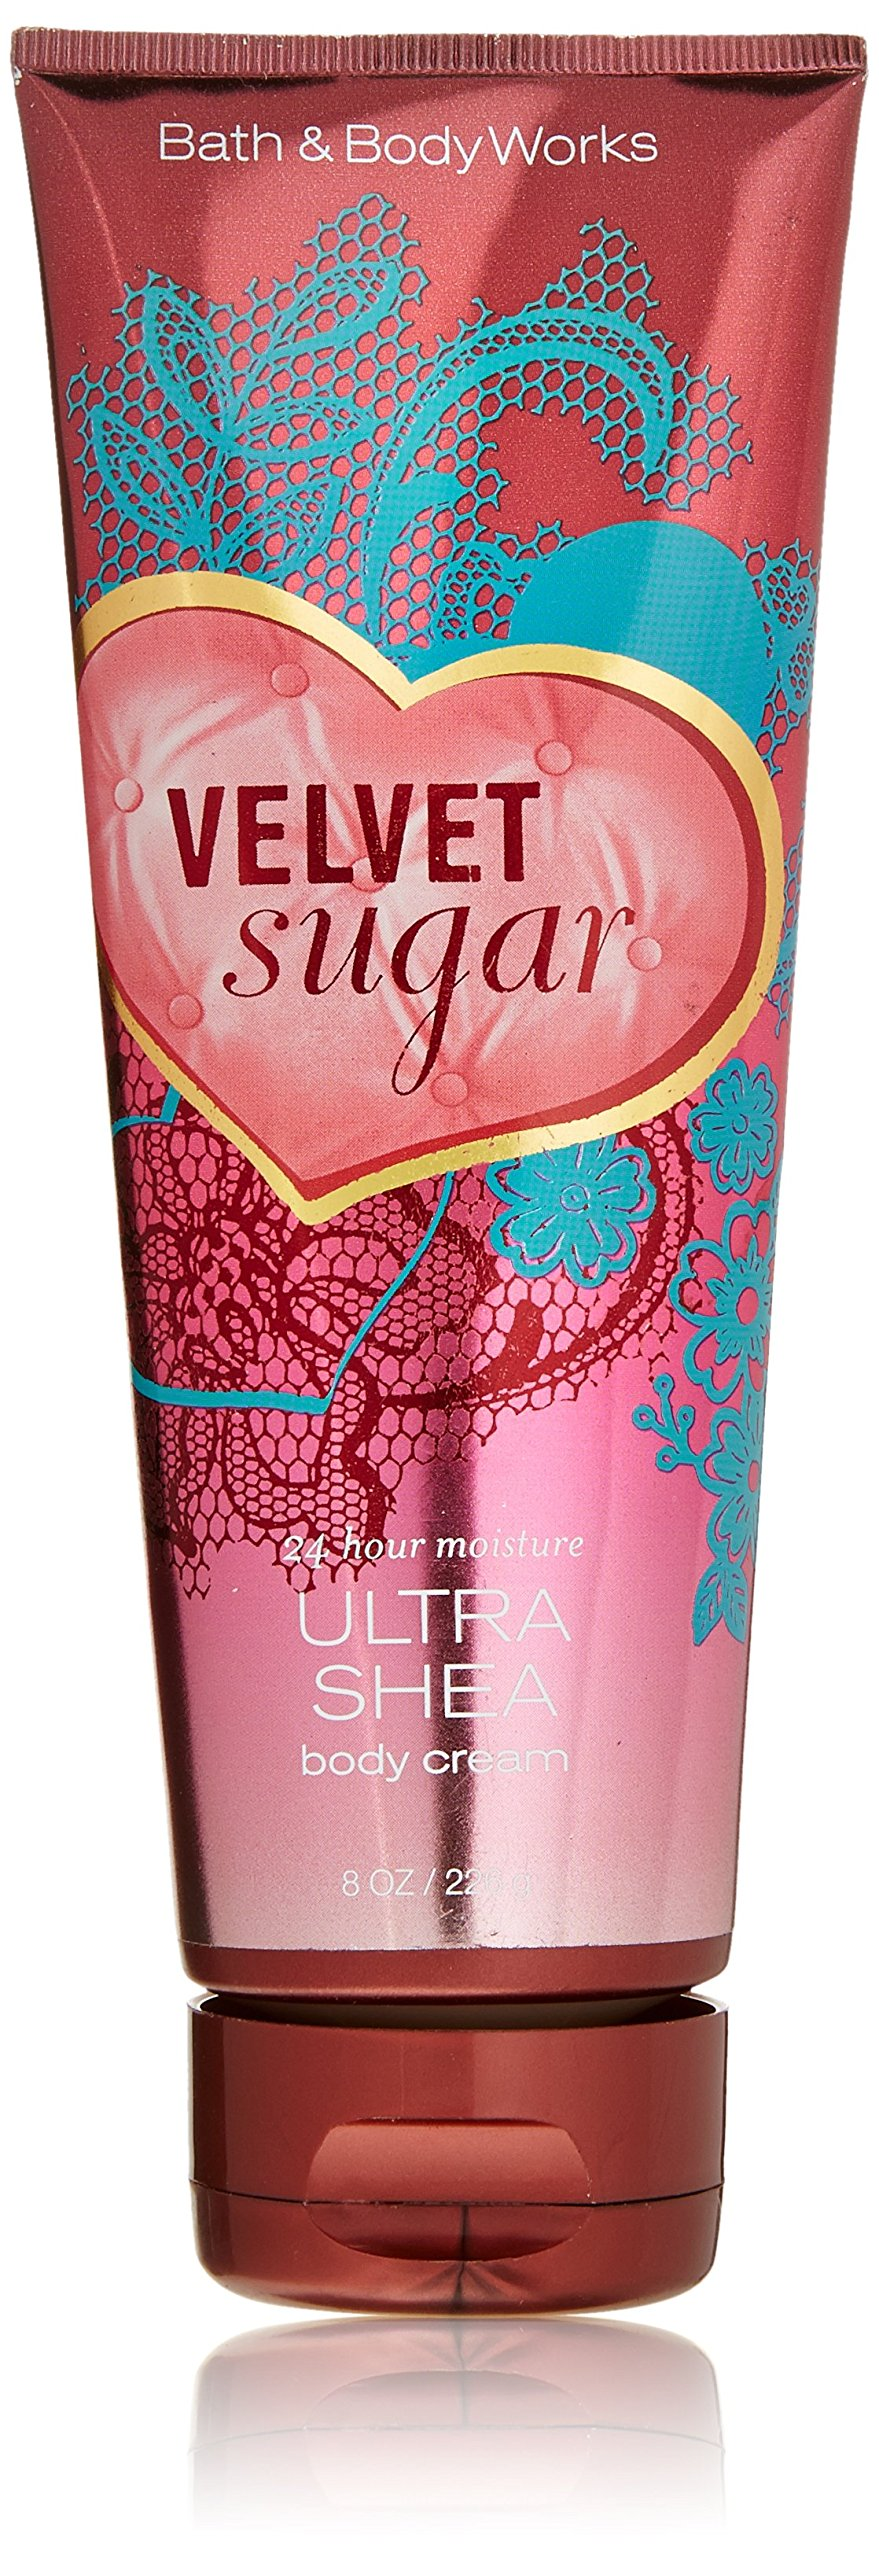 Bath & Body Works Velvet Sugar 8.0 oz Ultra Shea Body Cream